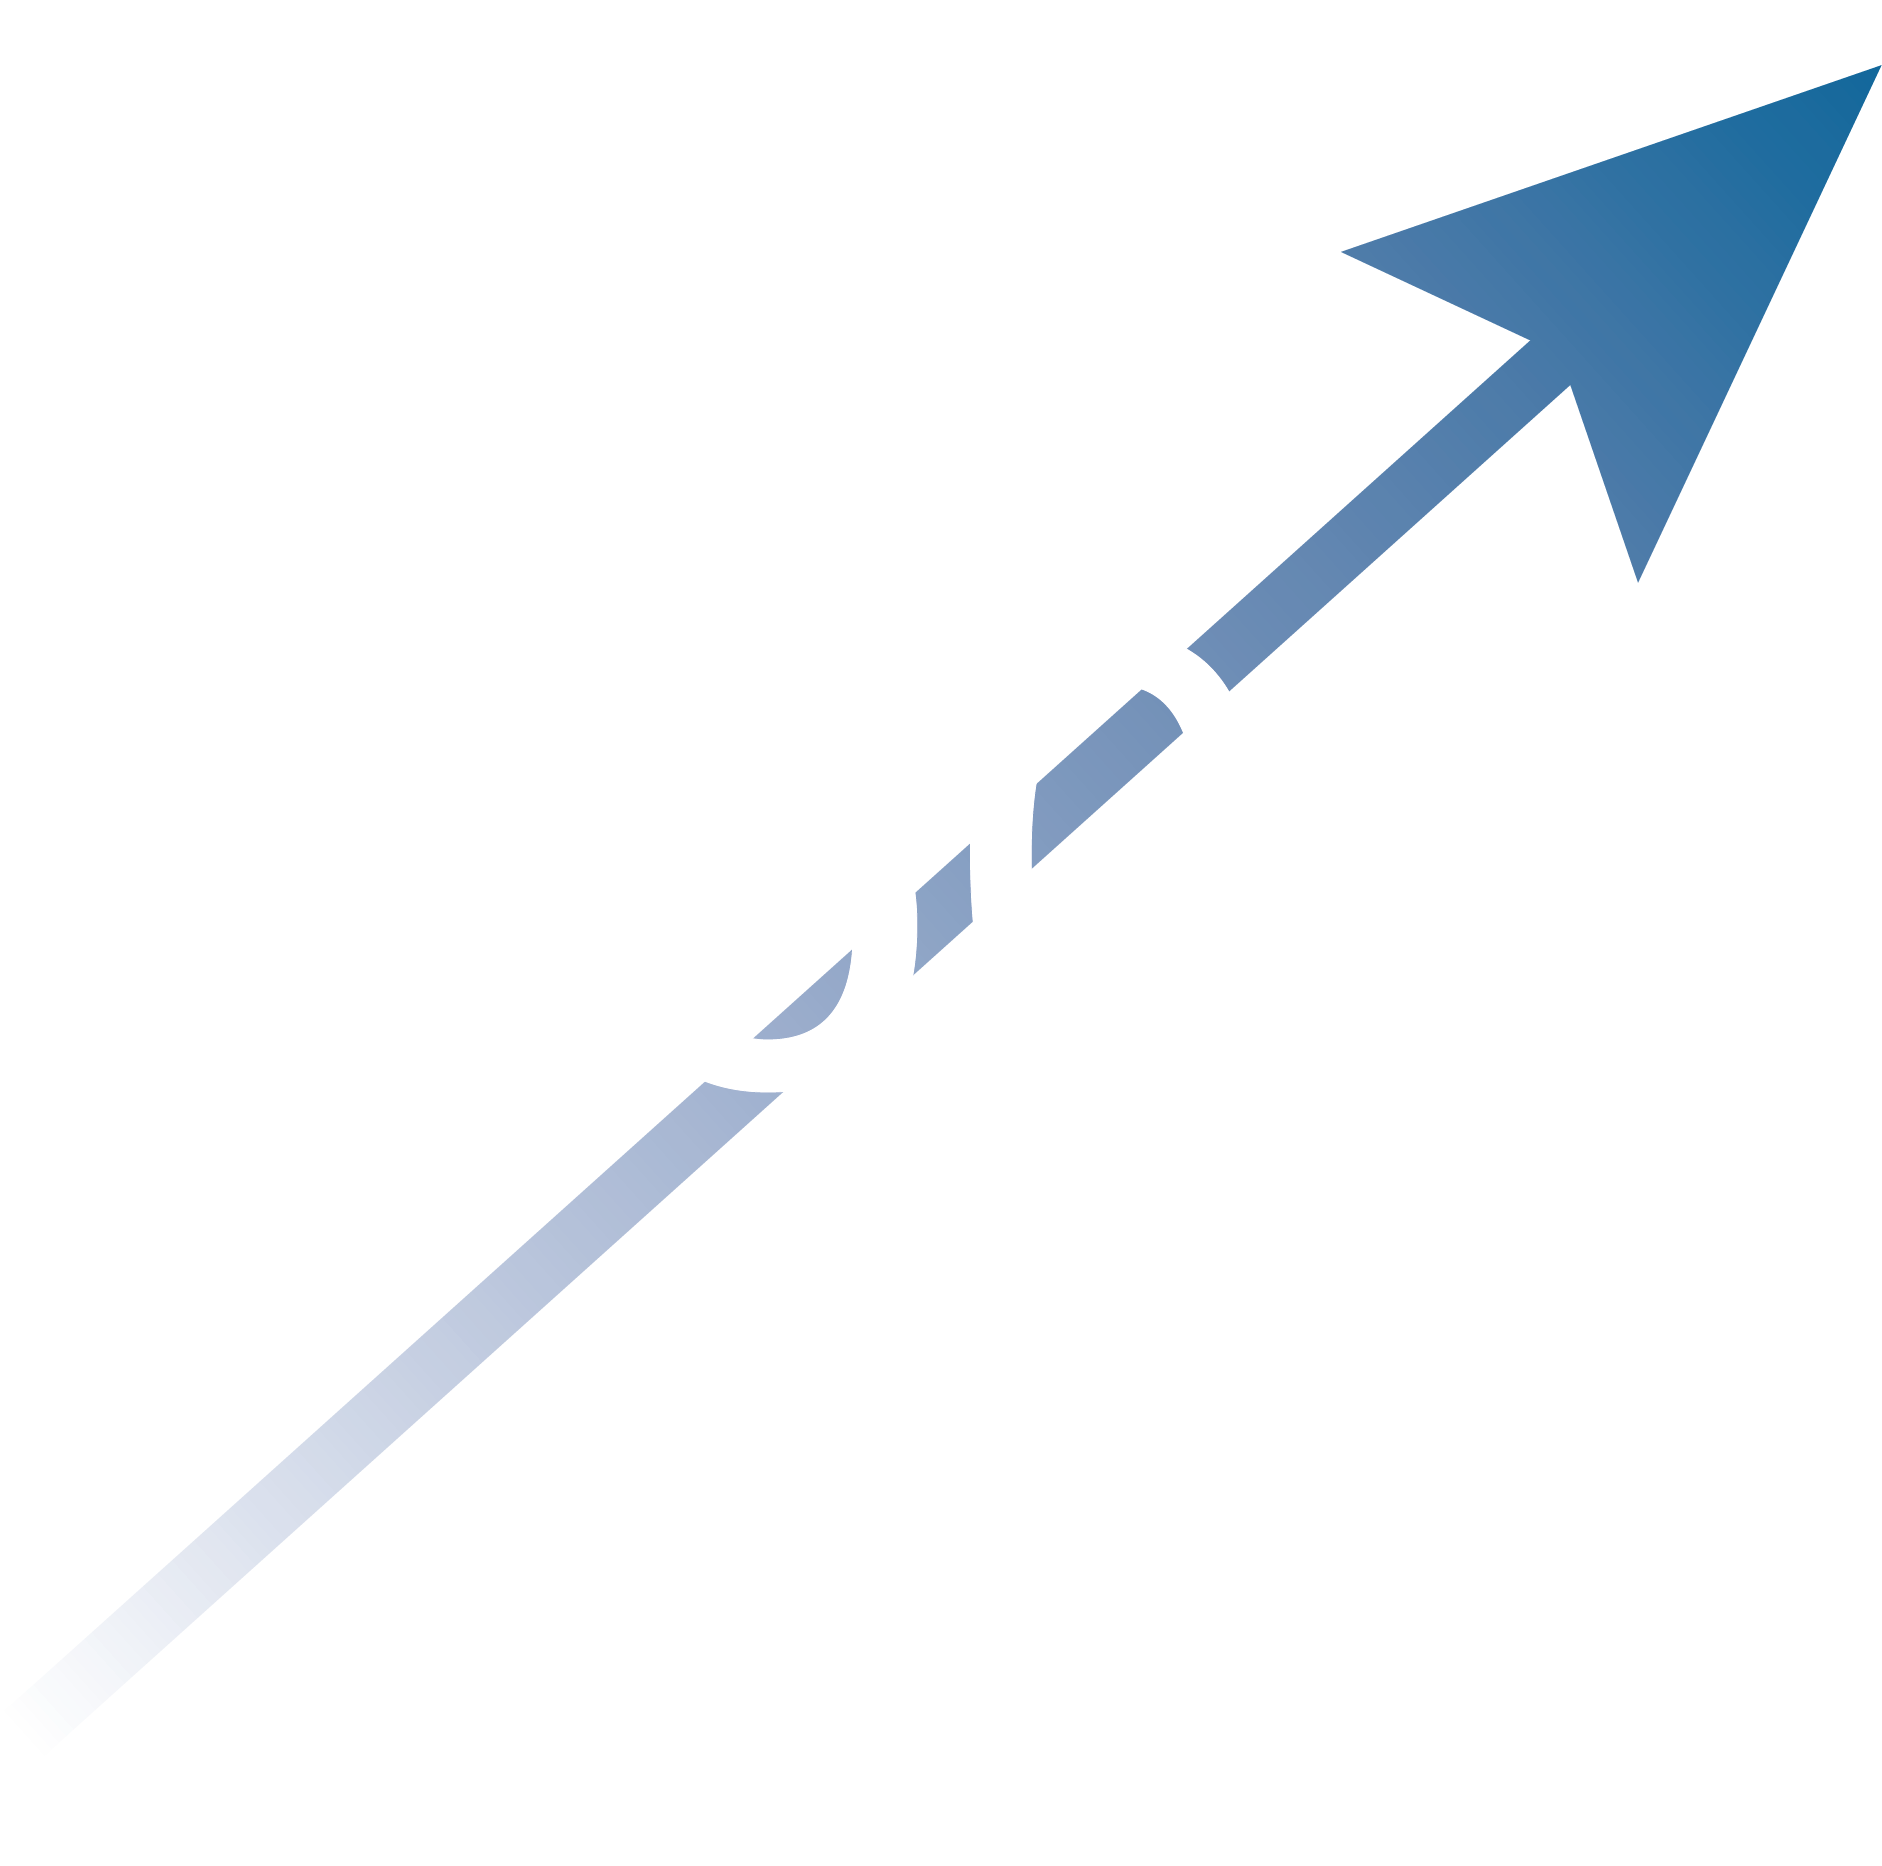 Beyond 50 Percent